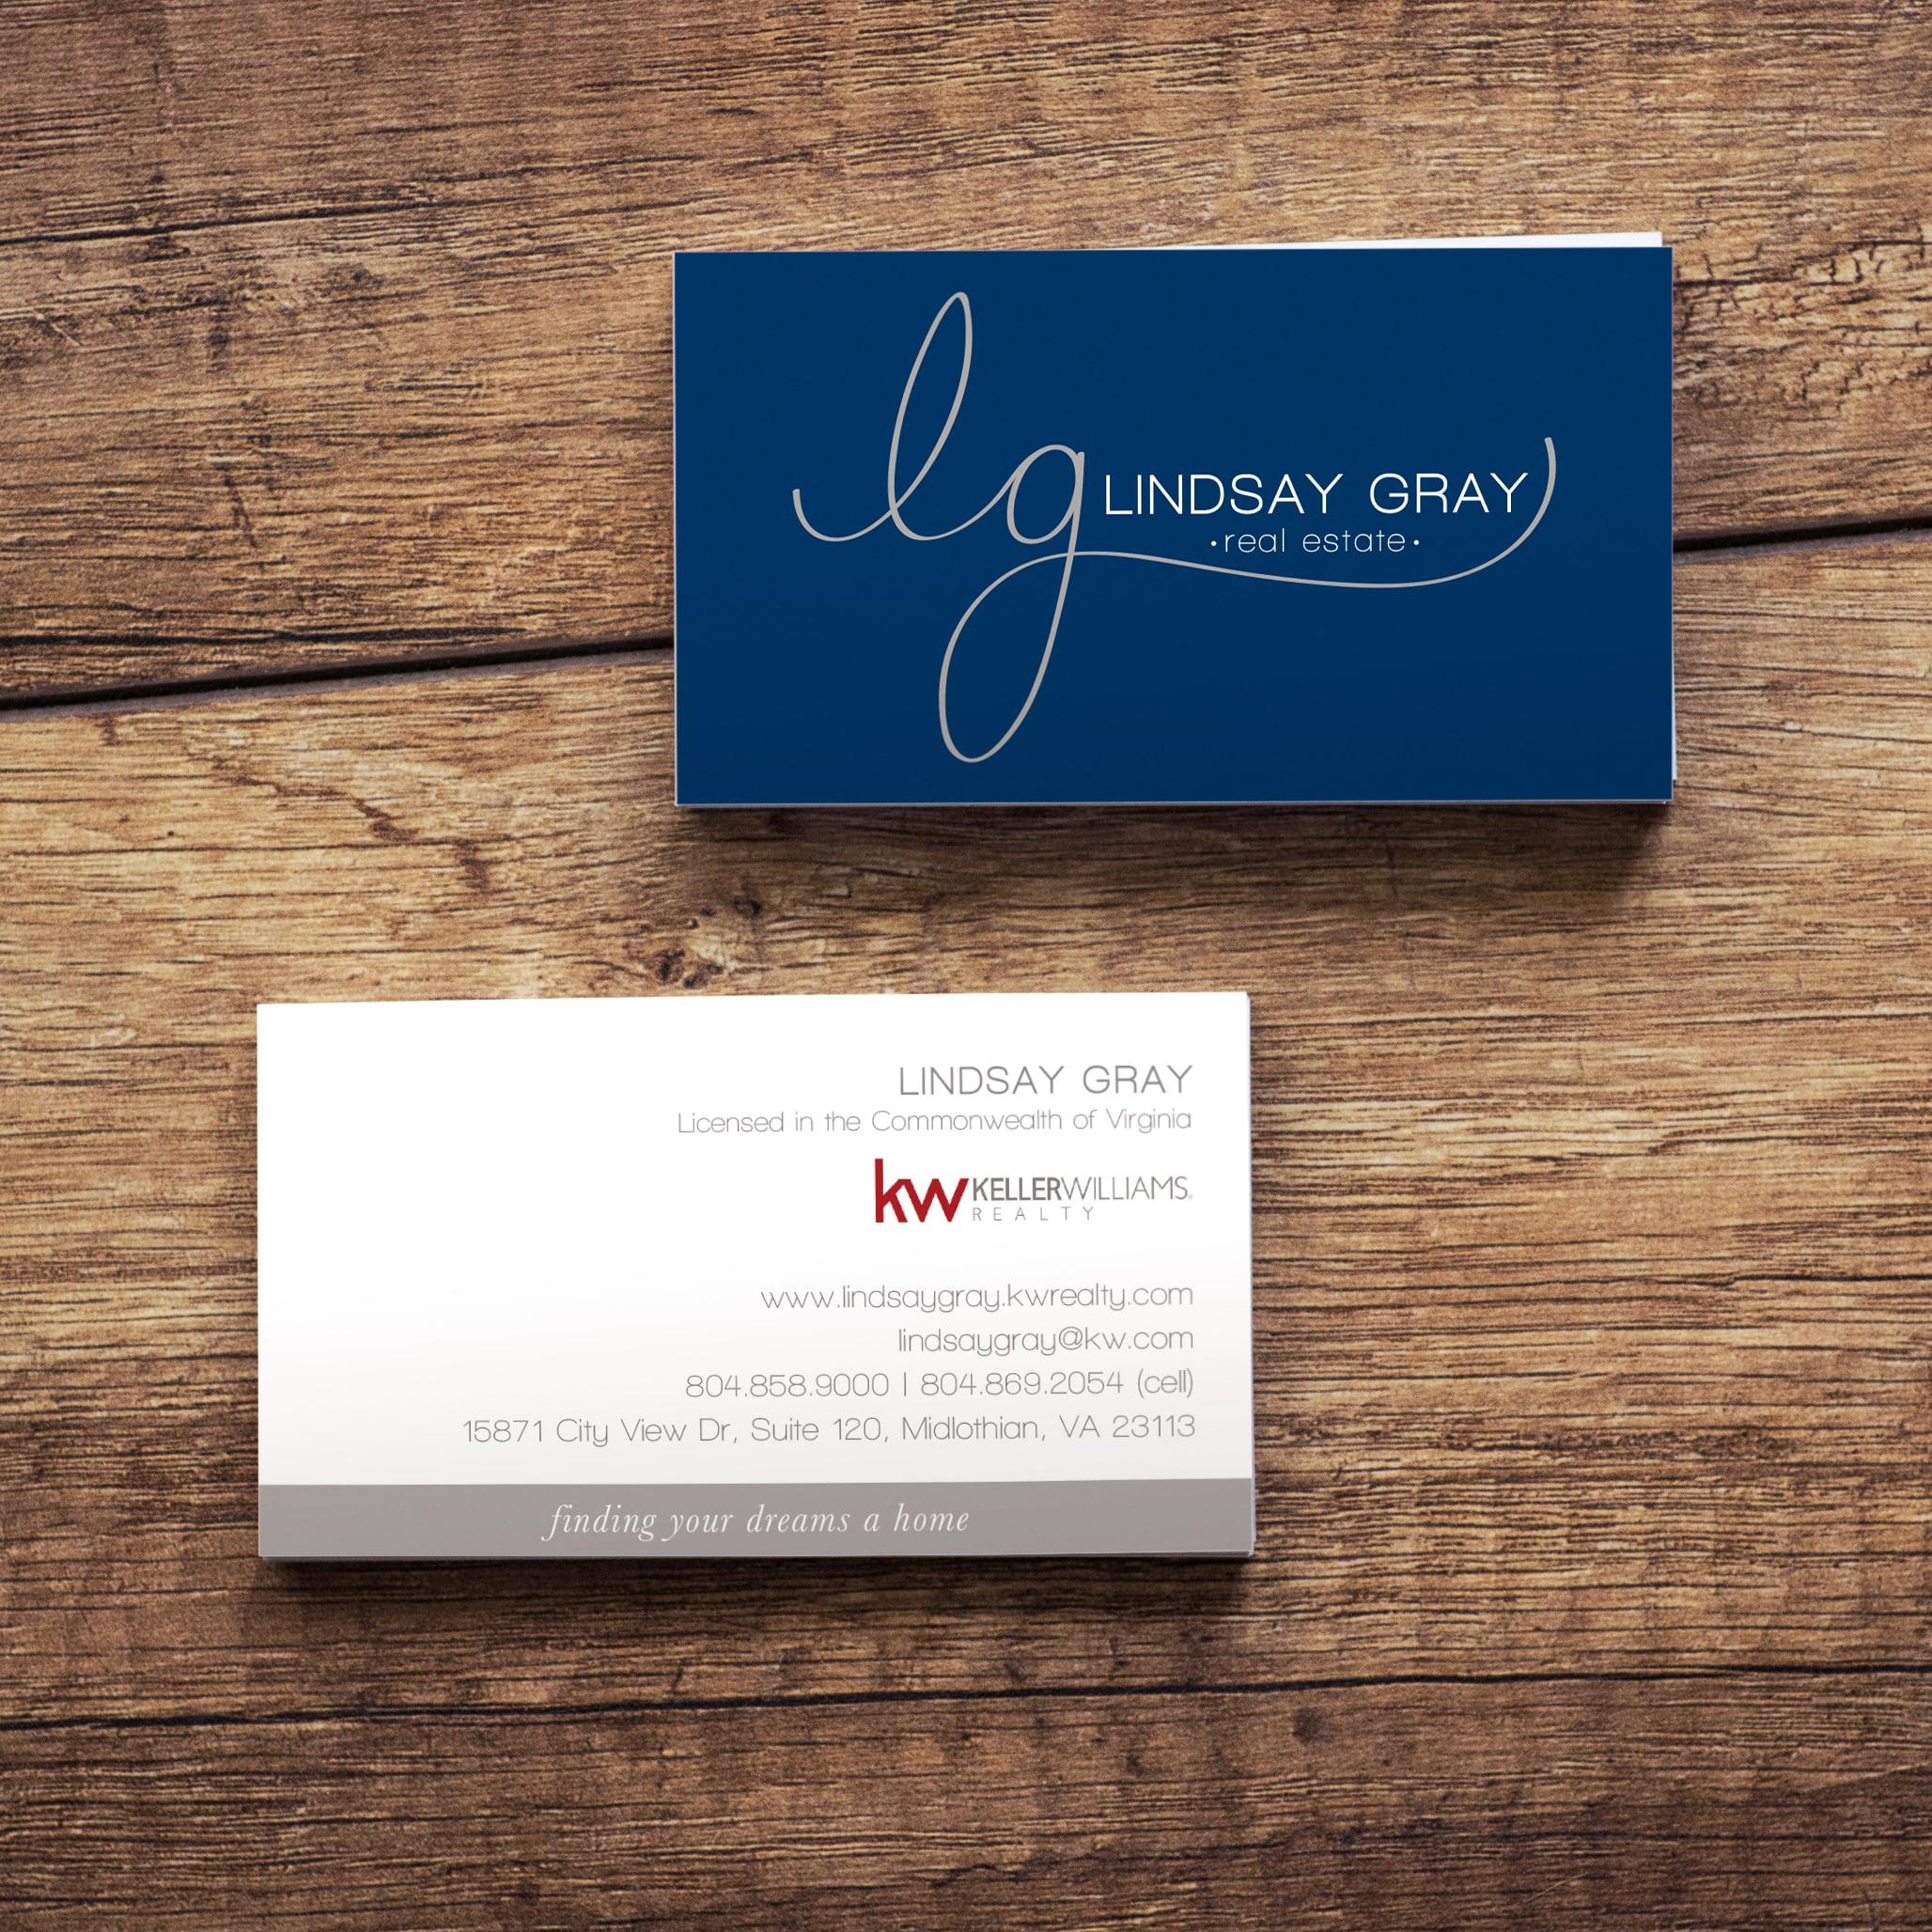 Lindsay-Gray_business_card_mockup_1.jpg